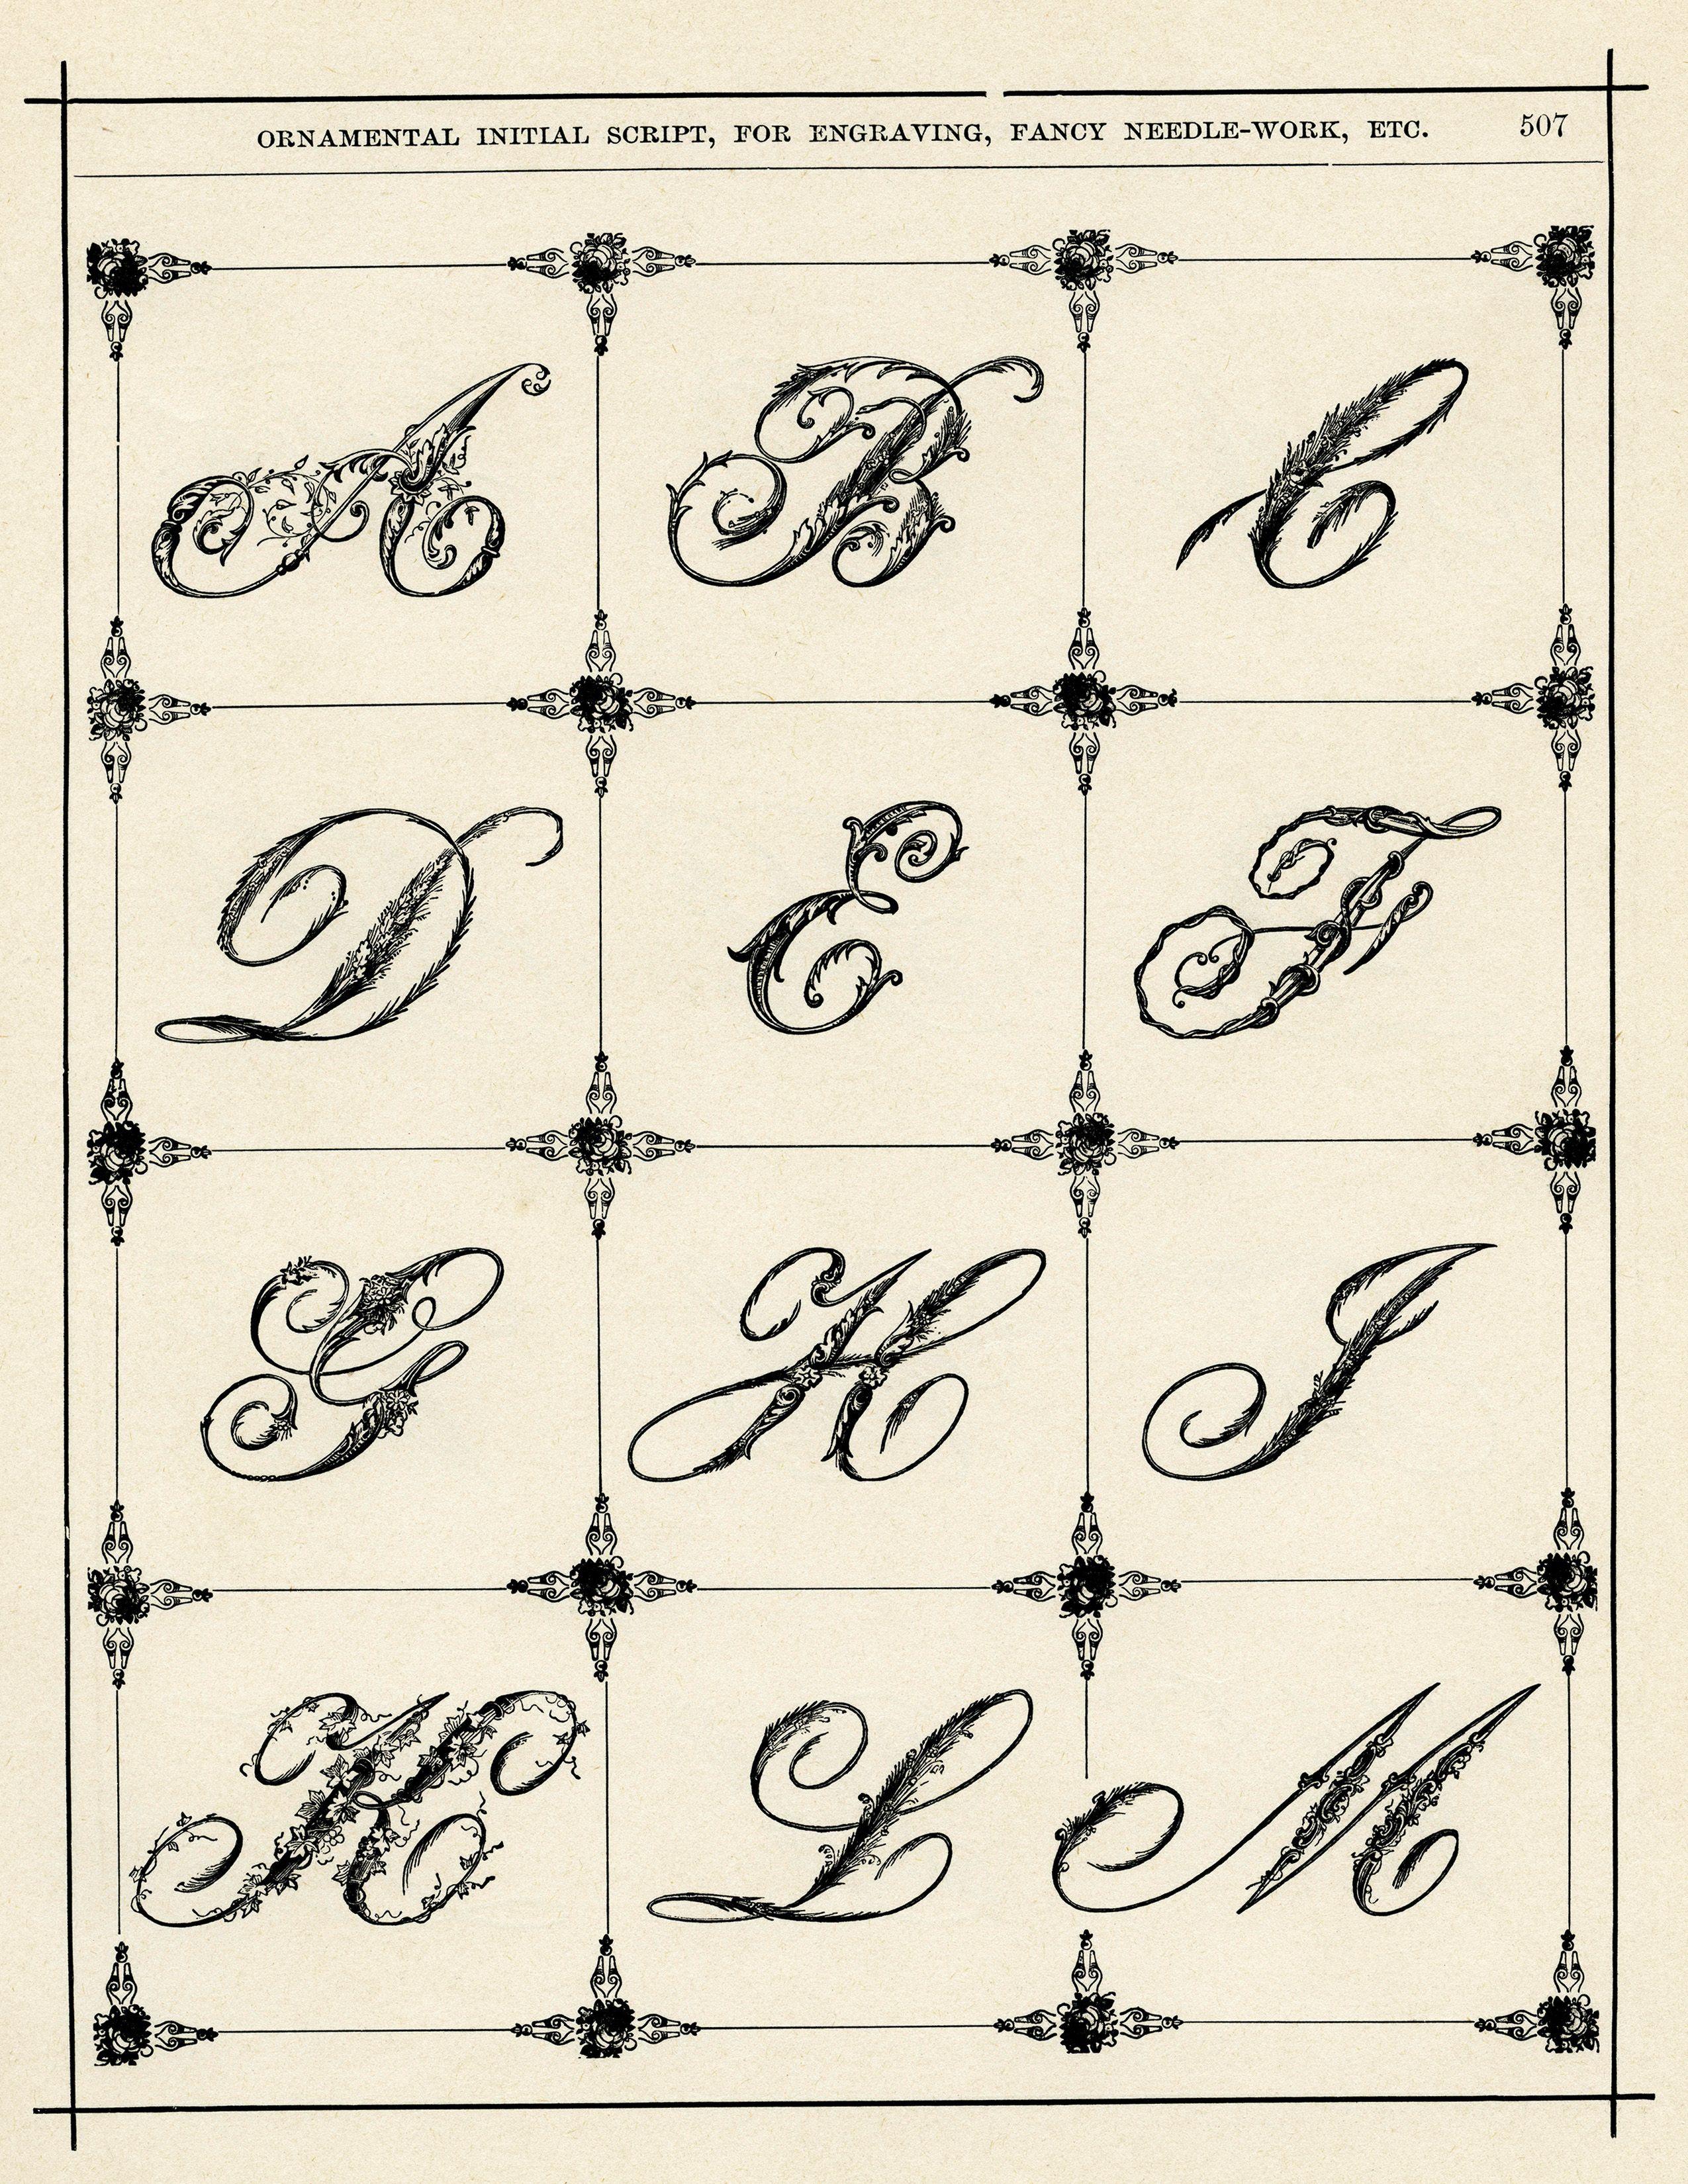 Letraset, Dry Transfer Lettering, Rub On, 10mm Lettering